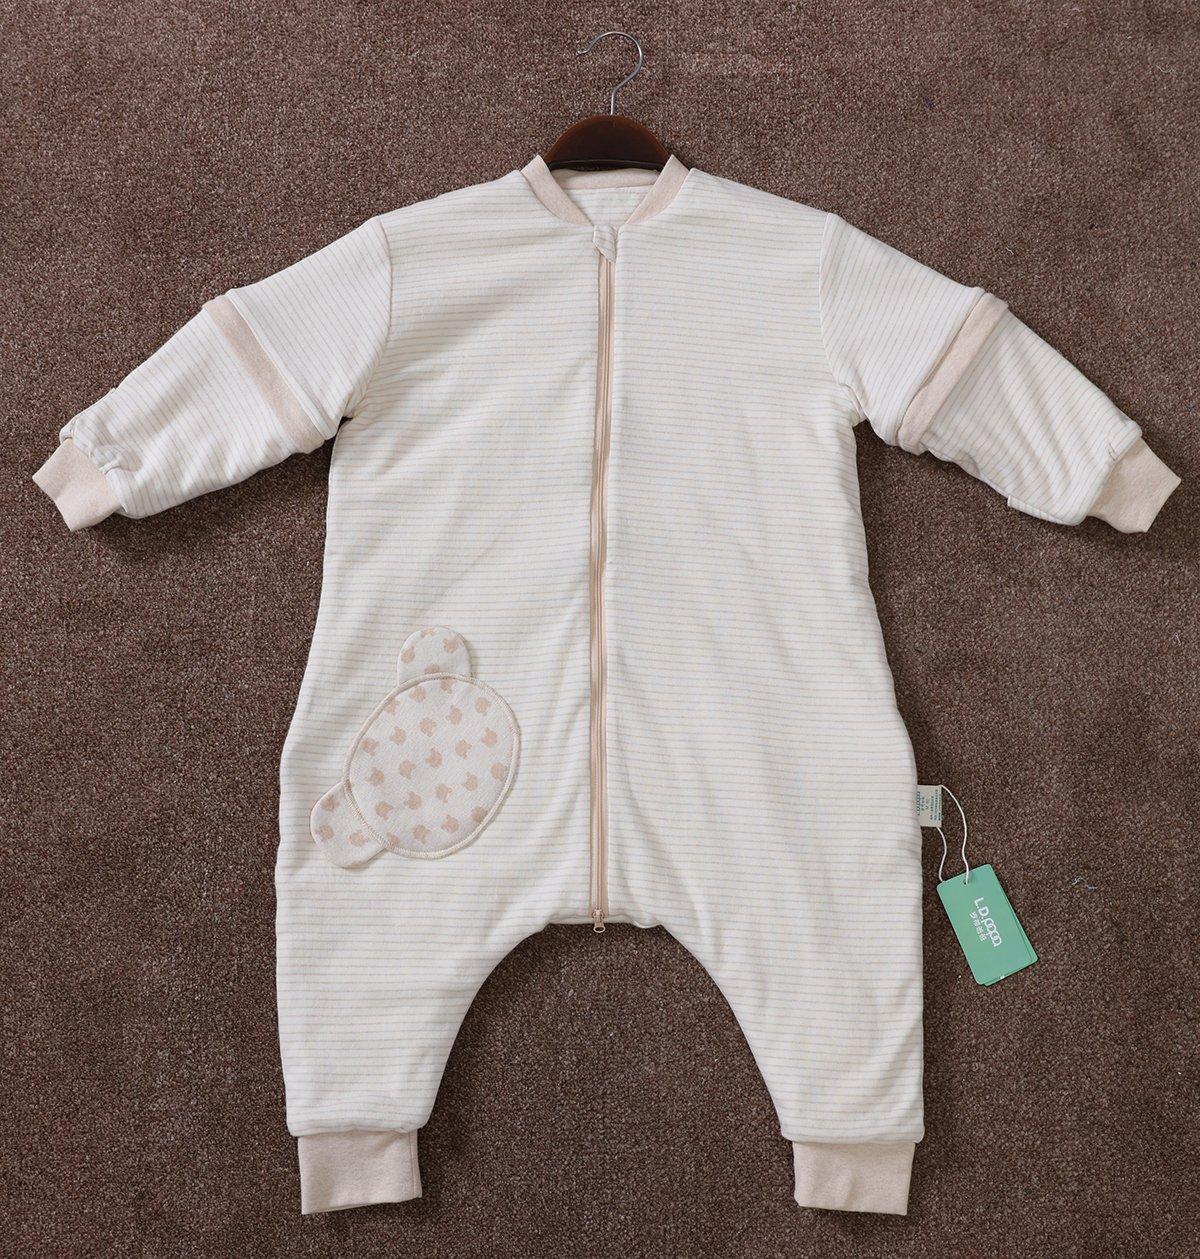 Silk Baby Sleep Nest Kids' Sleeping Bag New Style Big(4.5'-5.5')